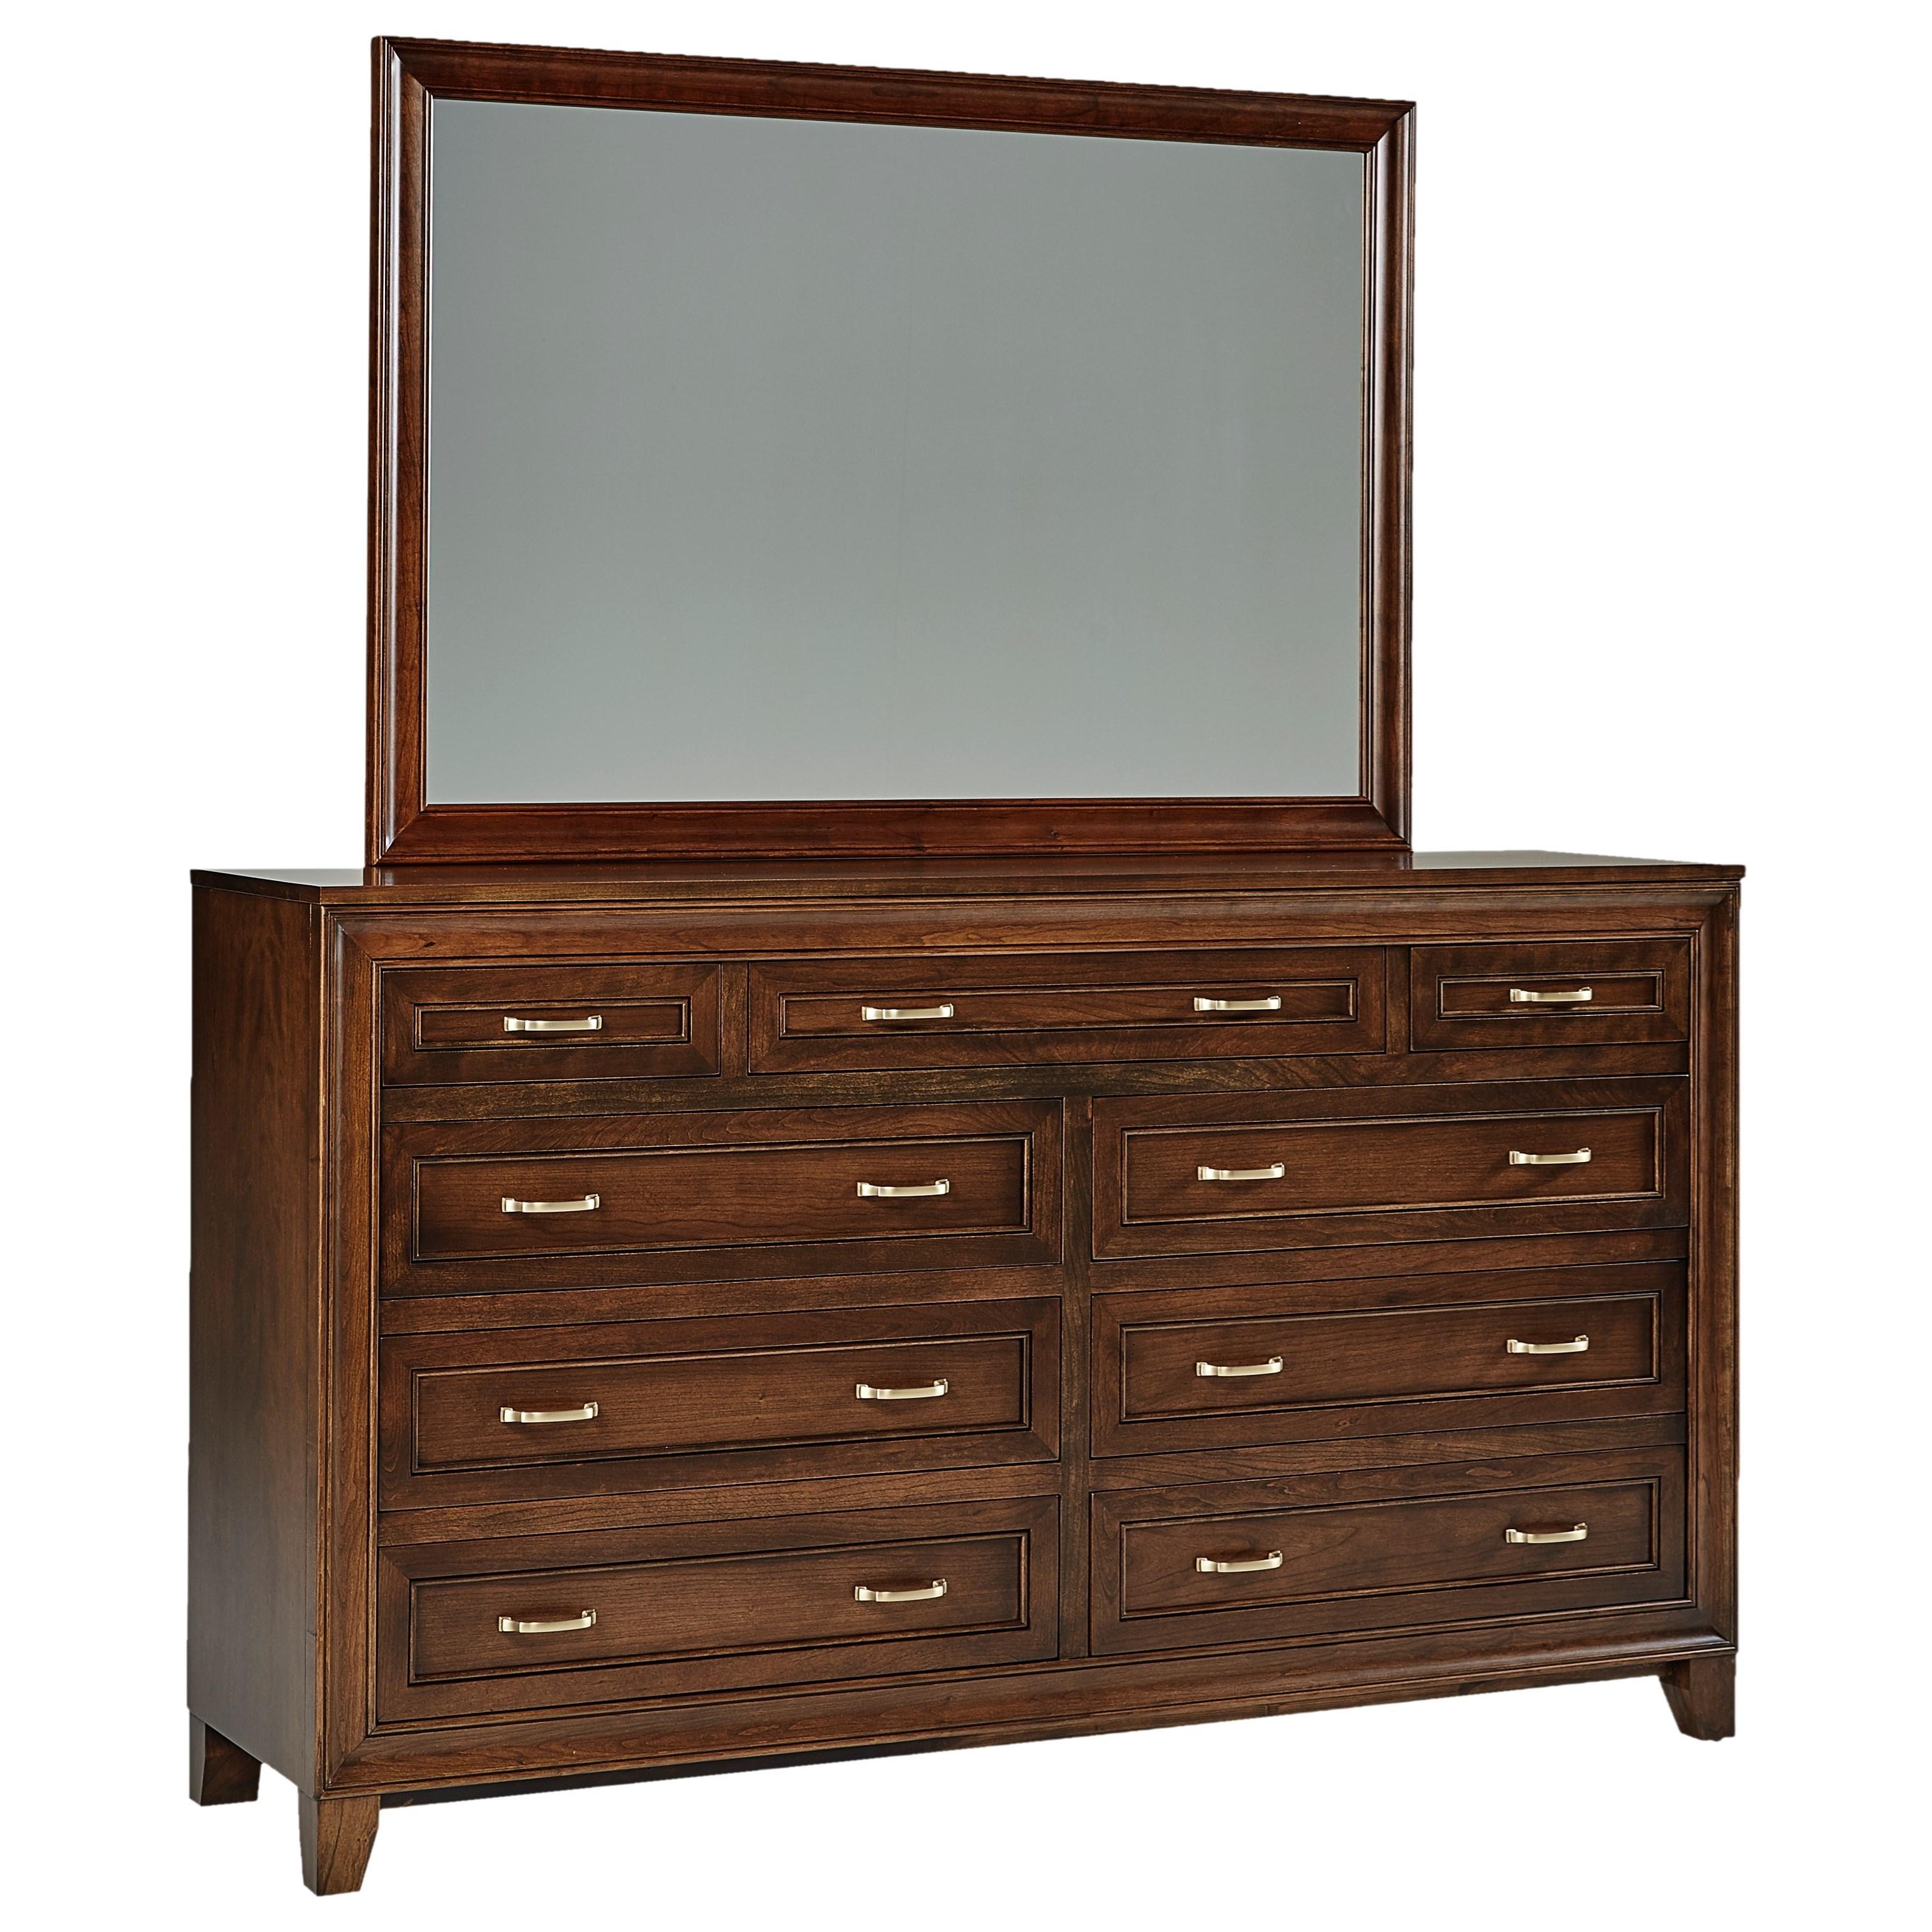 Summerville Dresser + Mirror Set by Daniel's Amish at Saugerties Furniture Mart